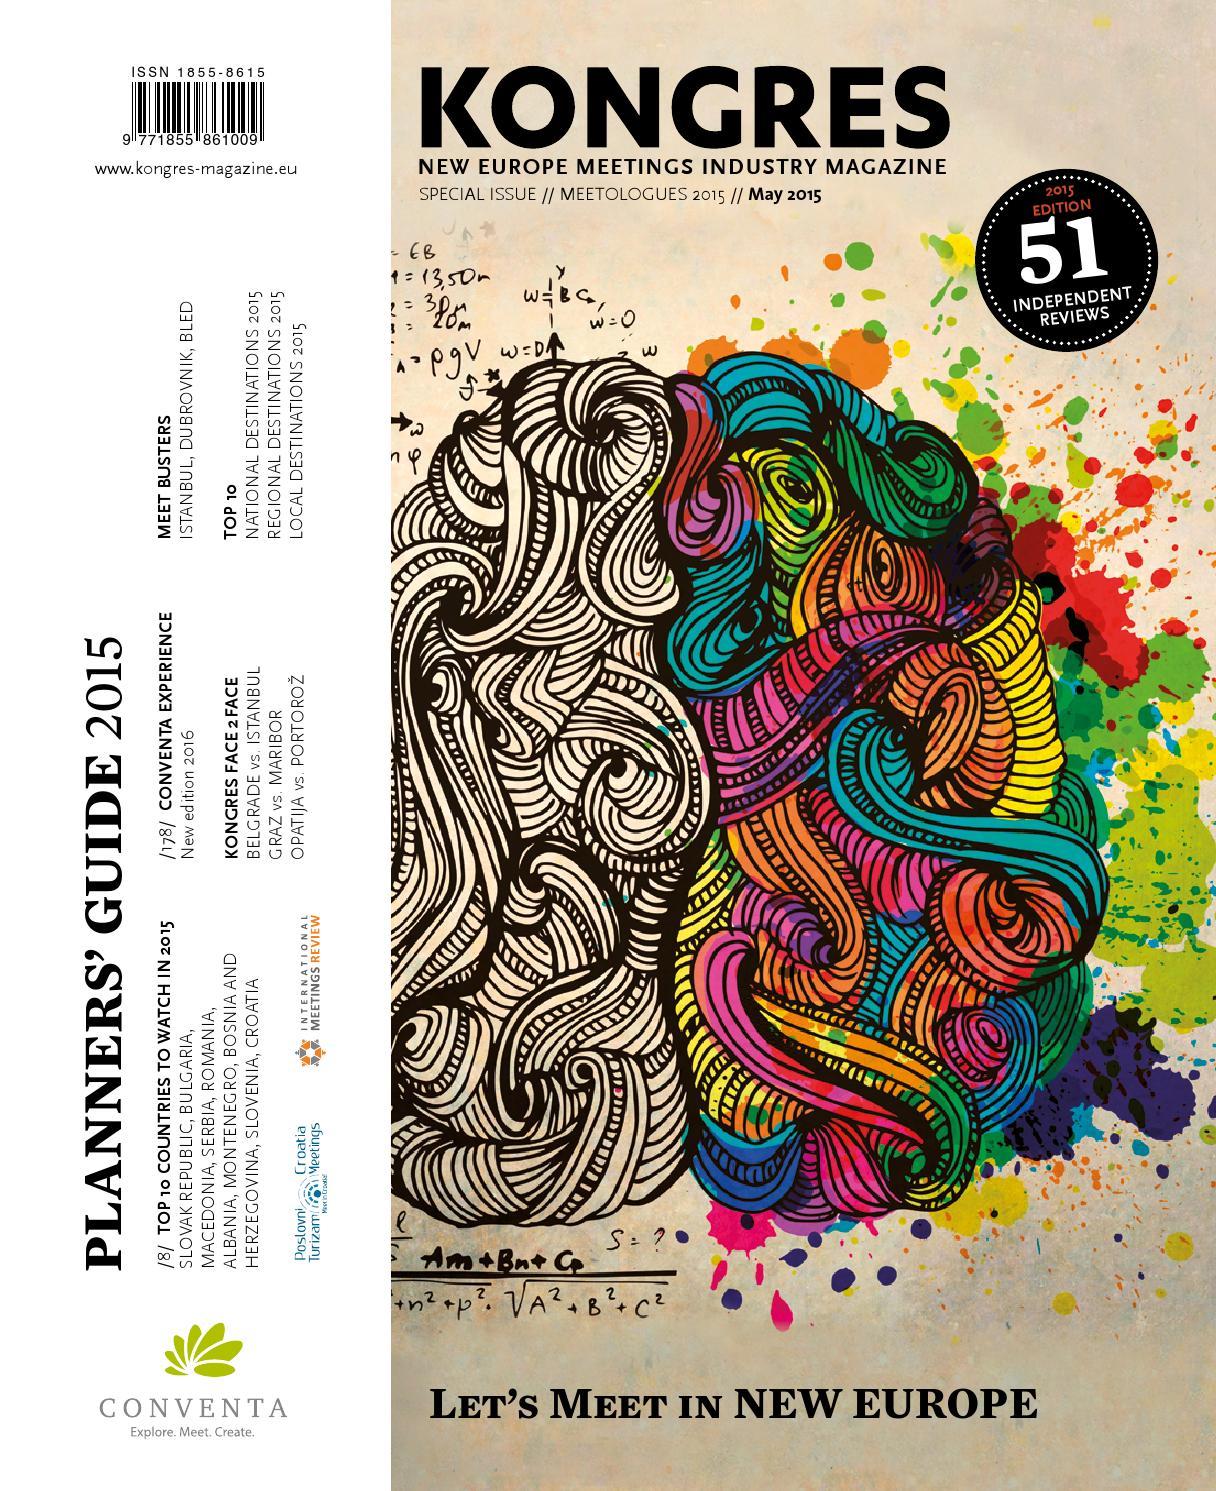 Kongres Magazine Mtlg2015 By Kongres Magazine Issuu